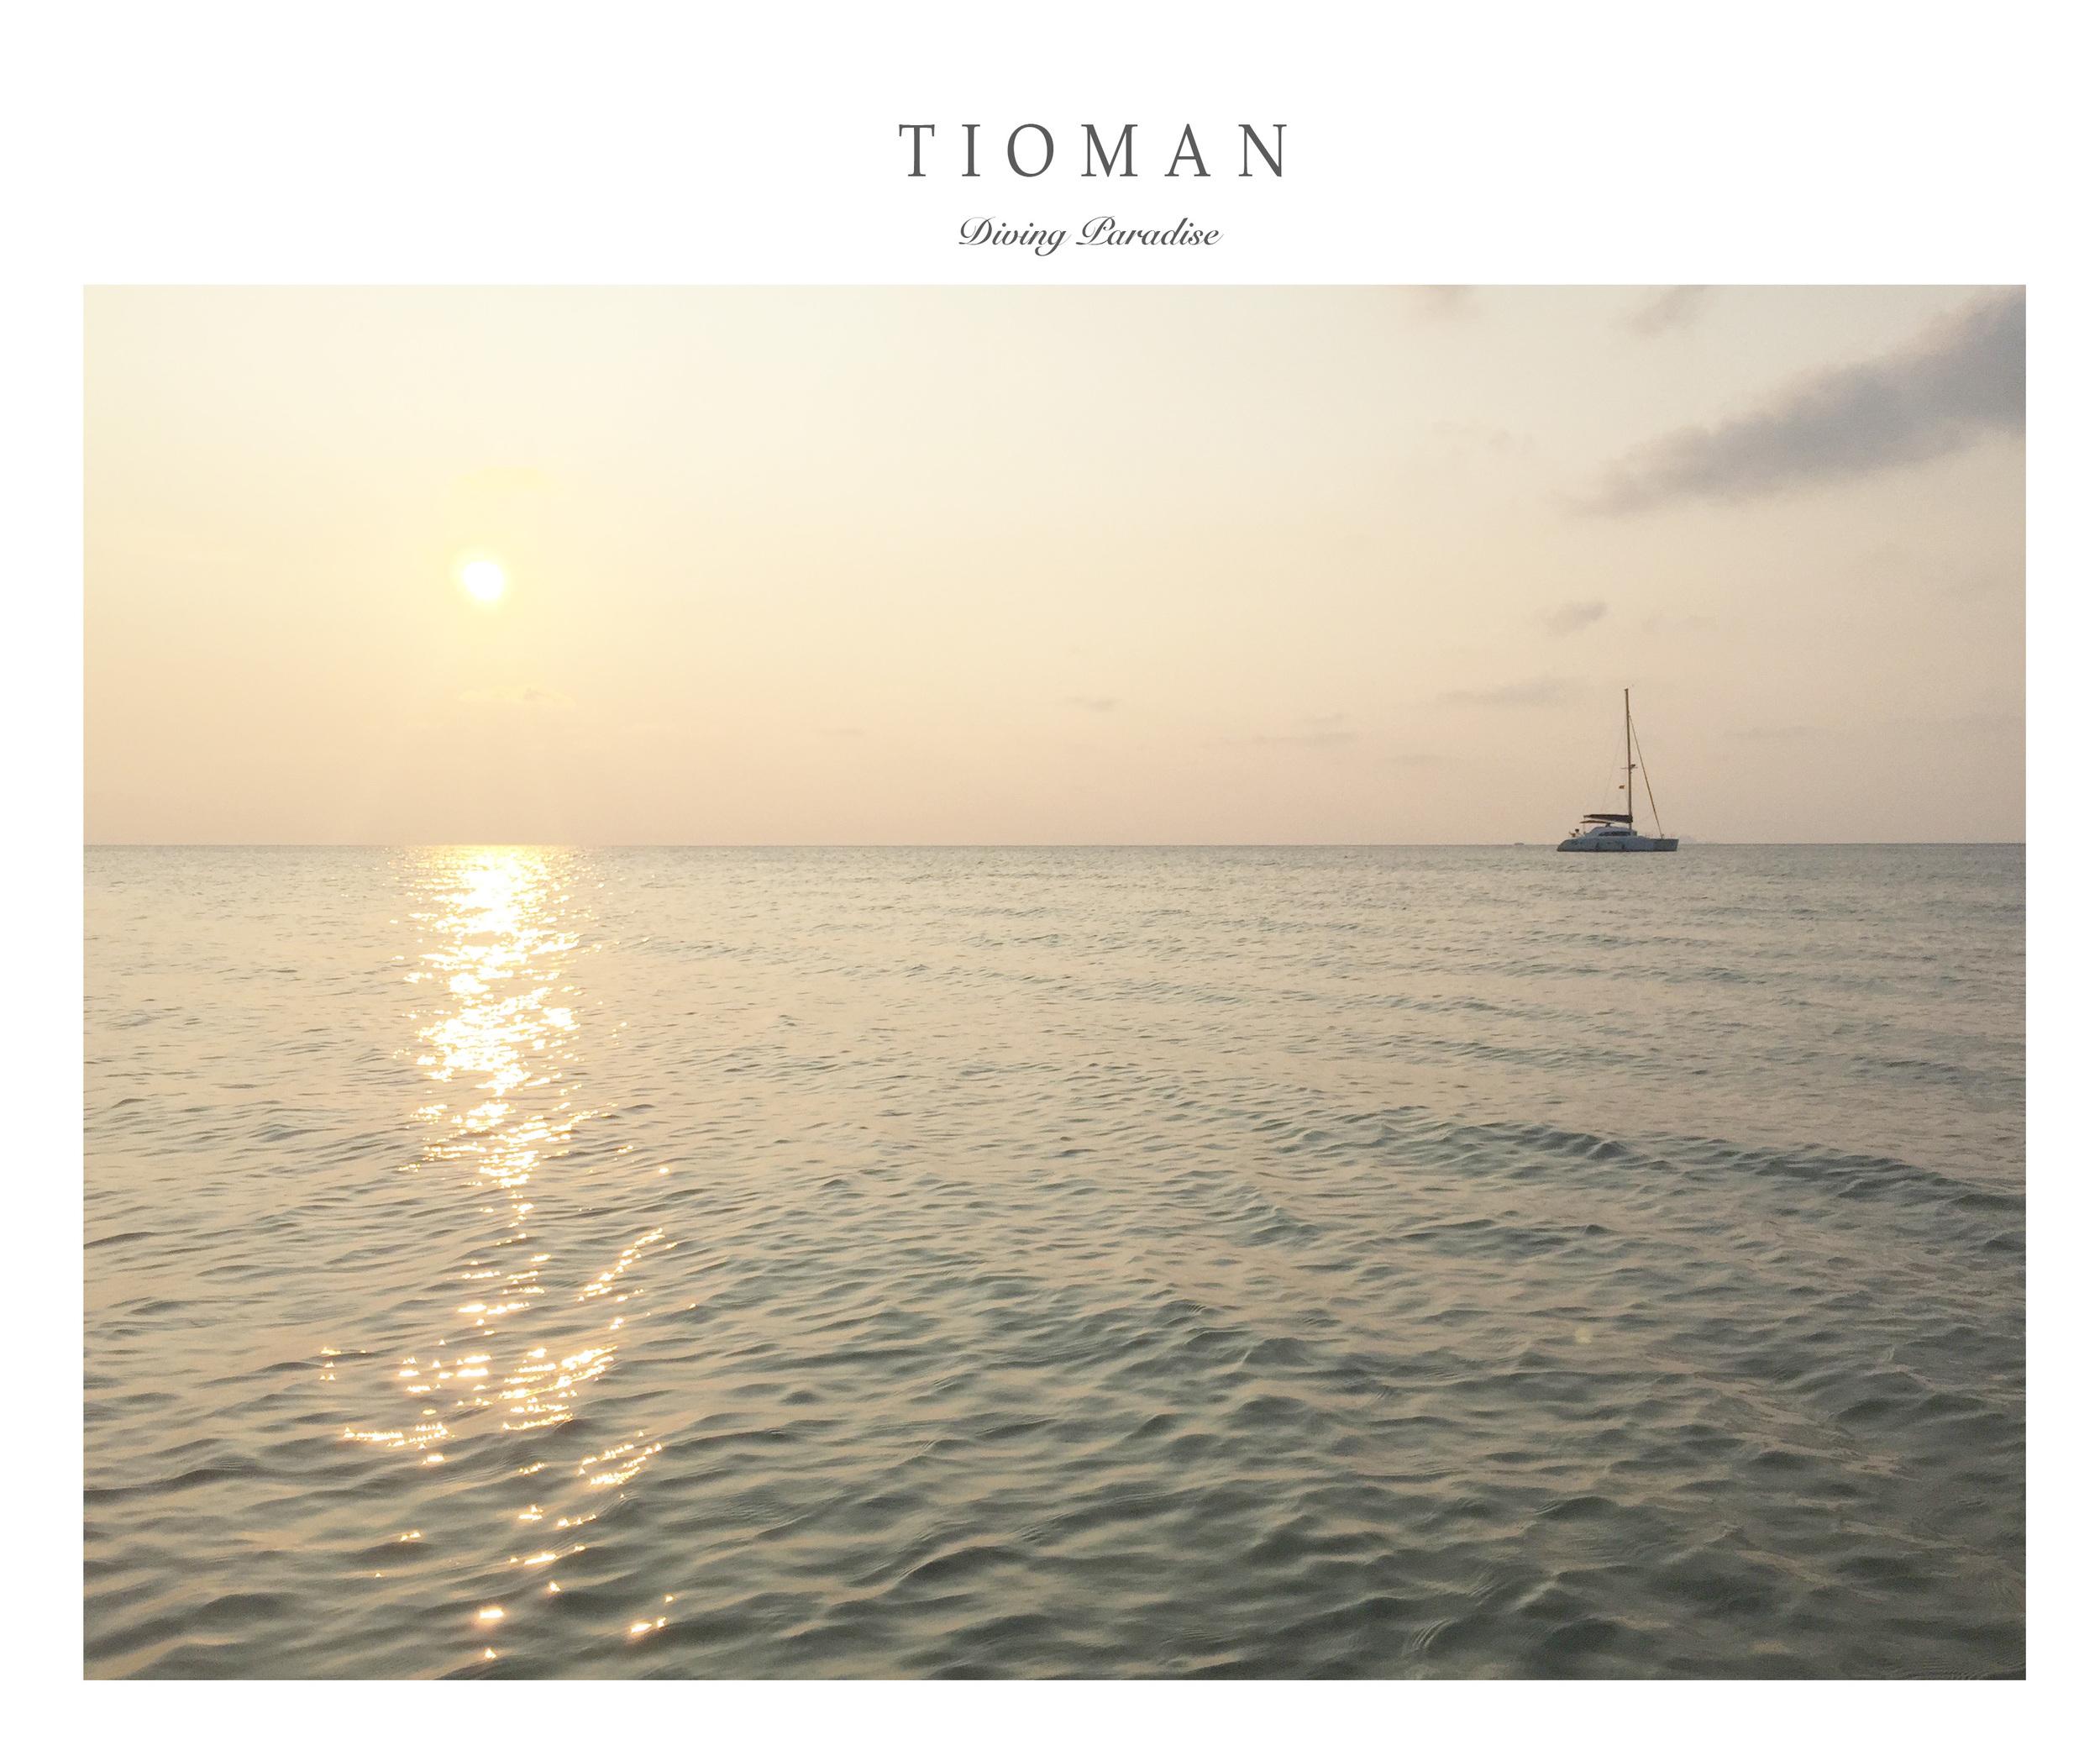 tioman cover